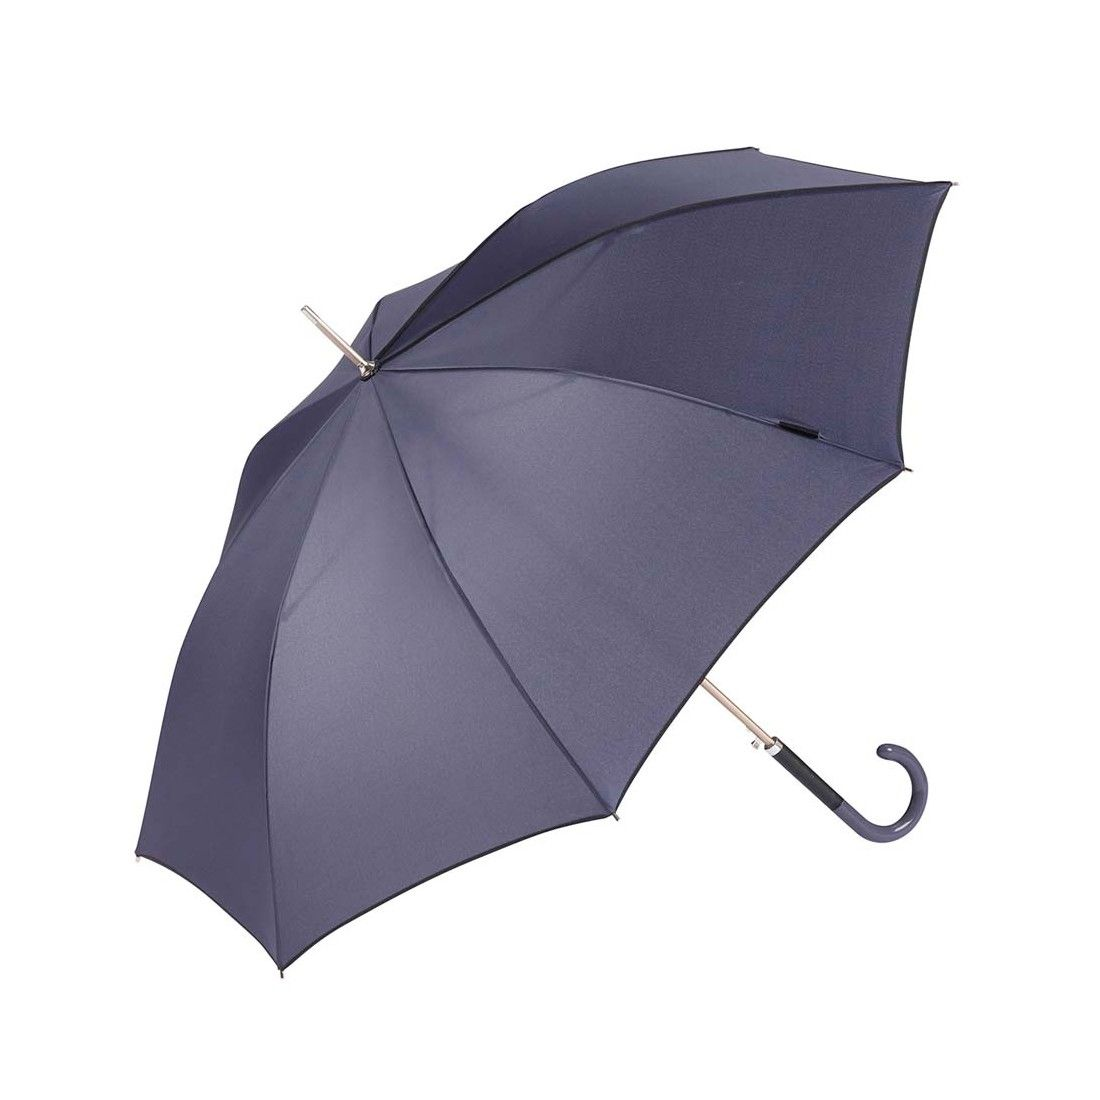 Paraguas 10713 Ezpeleta - 1